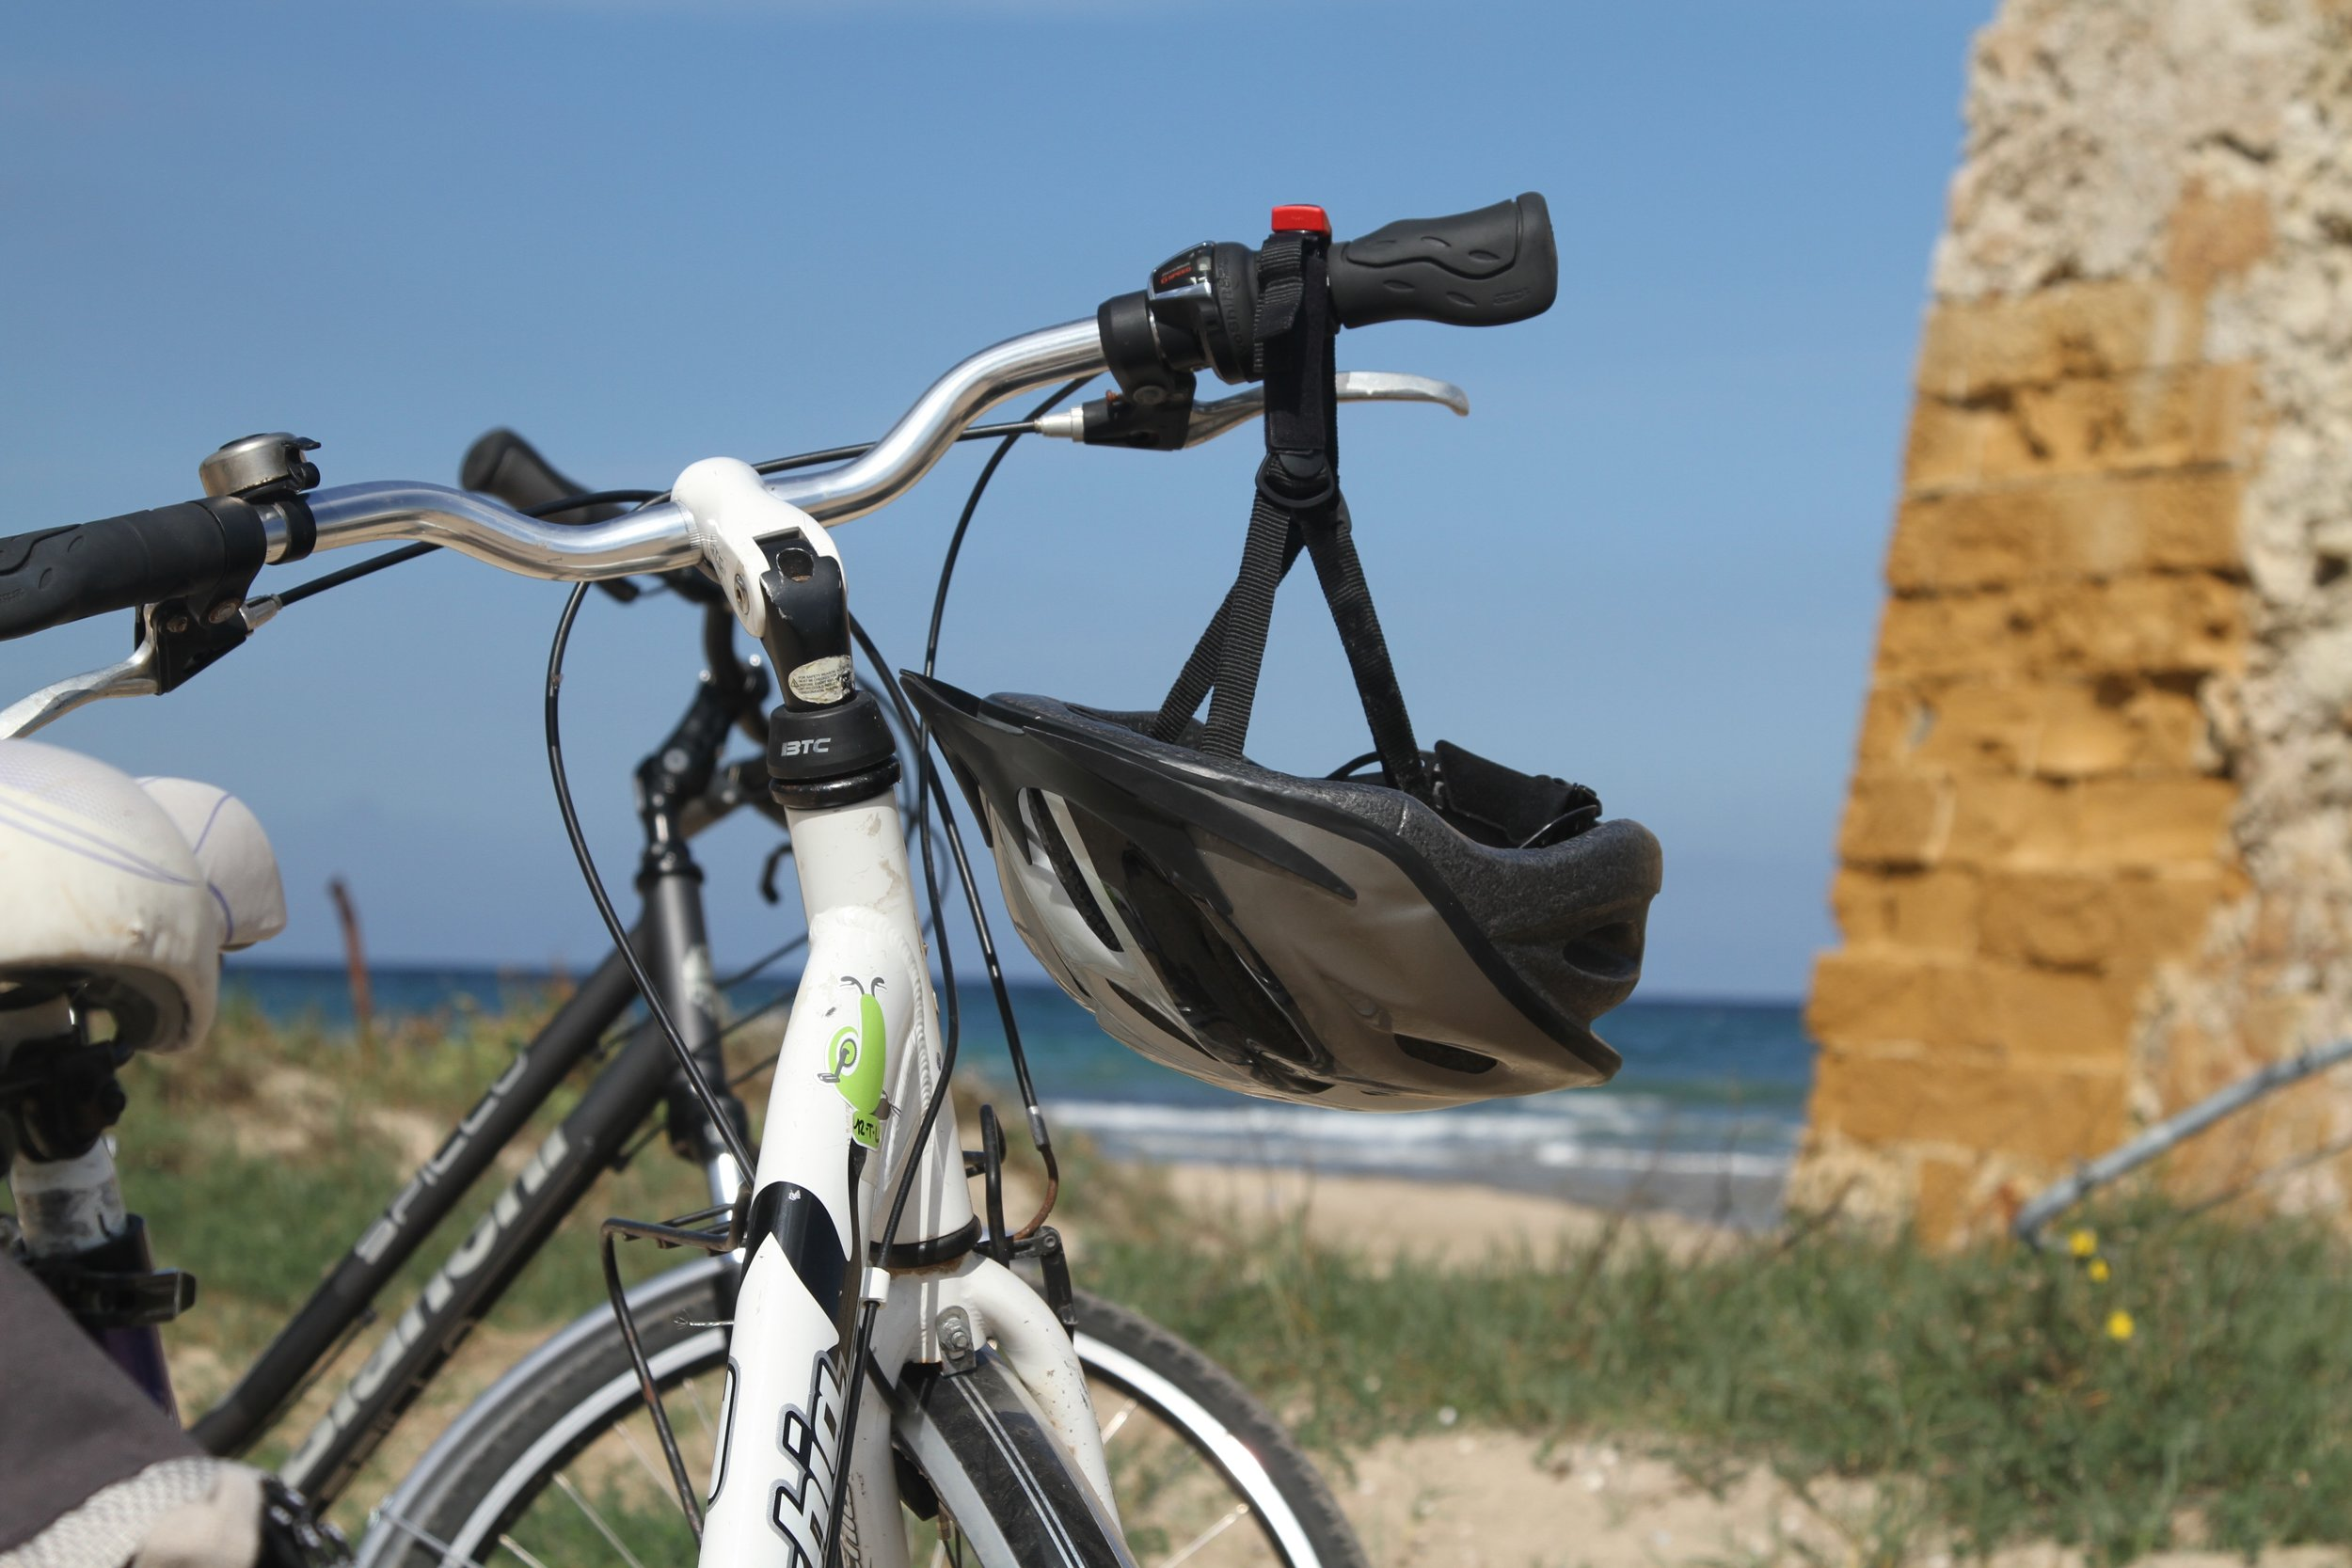 provenzani_biking_663.jpg